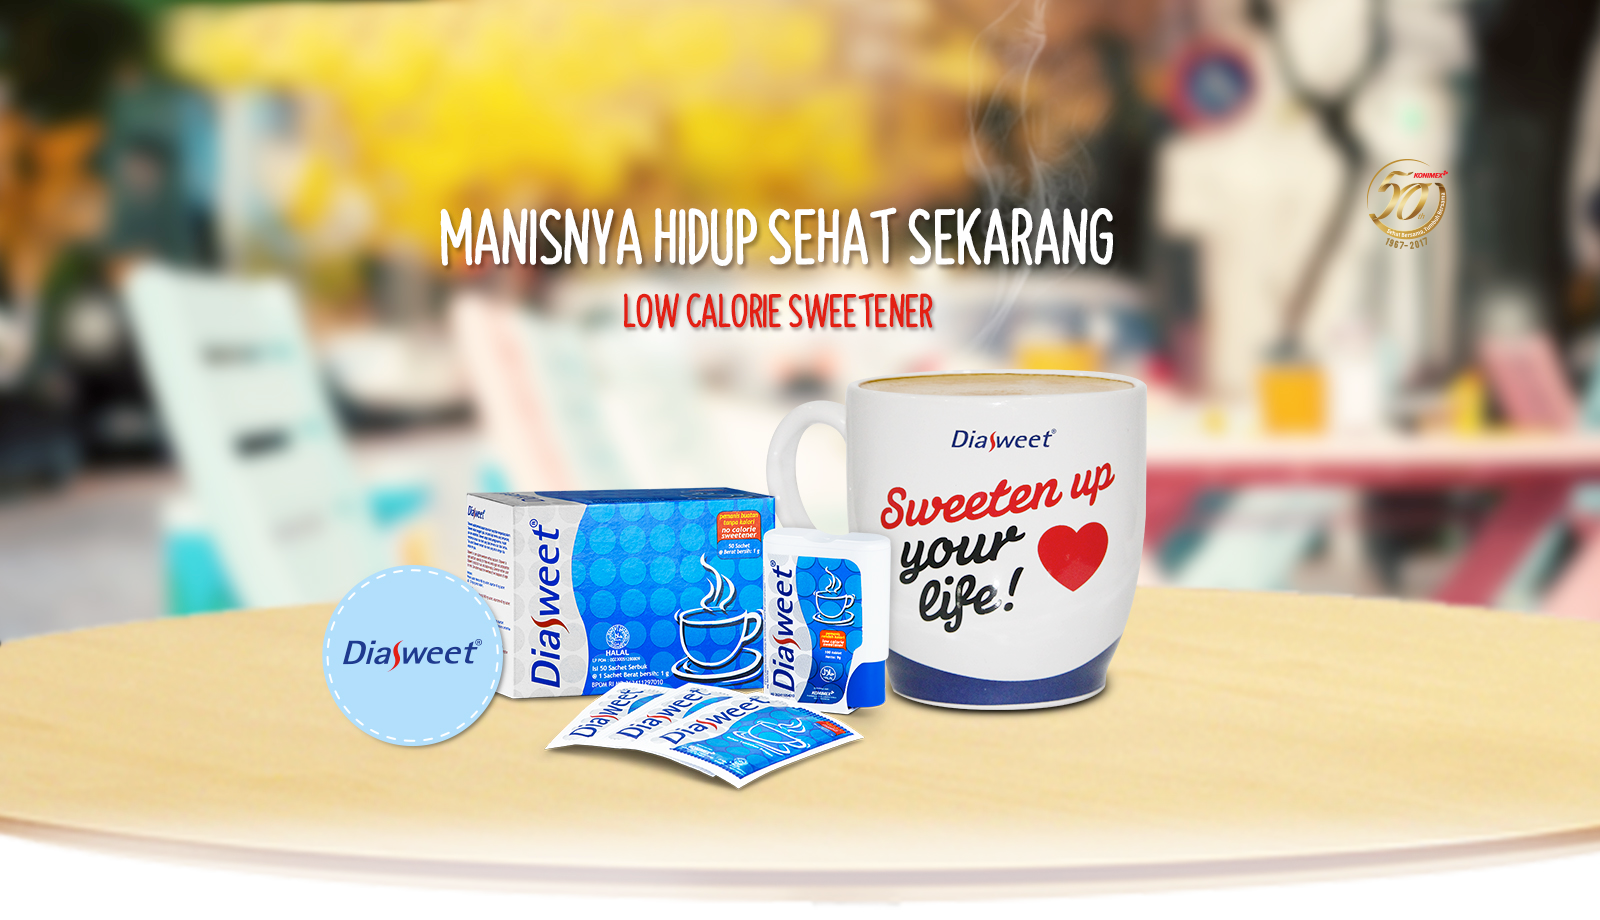 Diasweet Sweetener